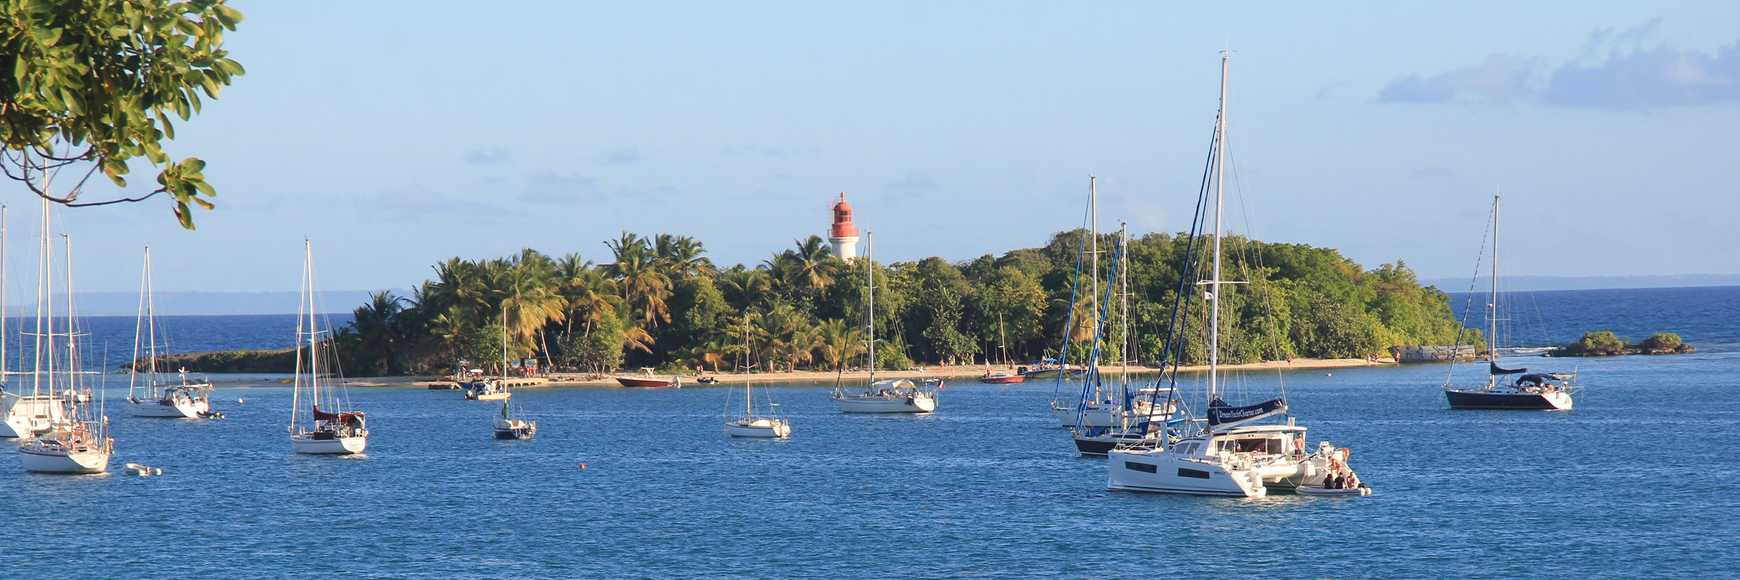 catamaran charter Caribbean